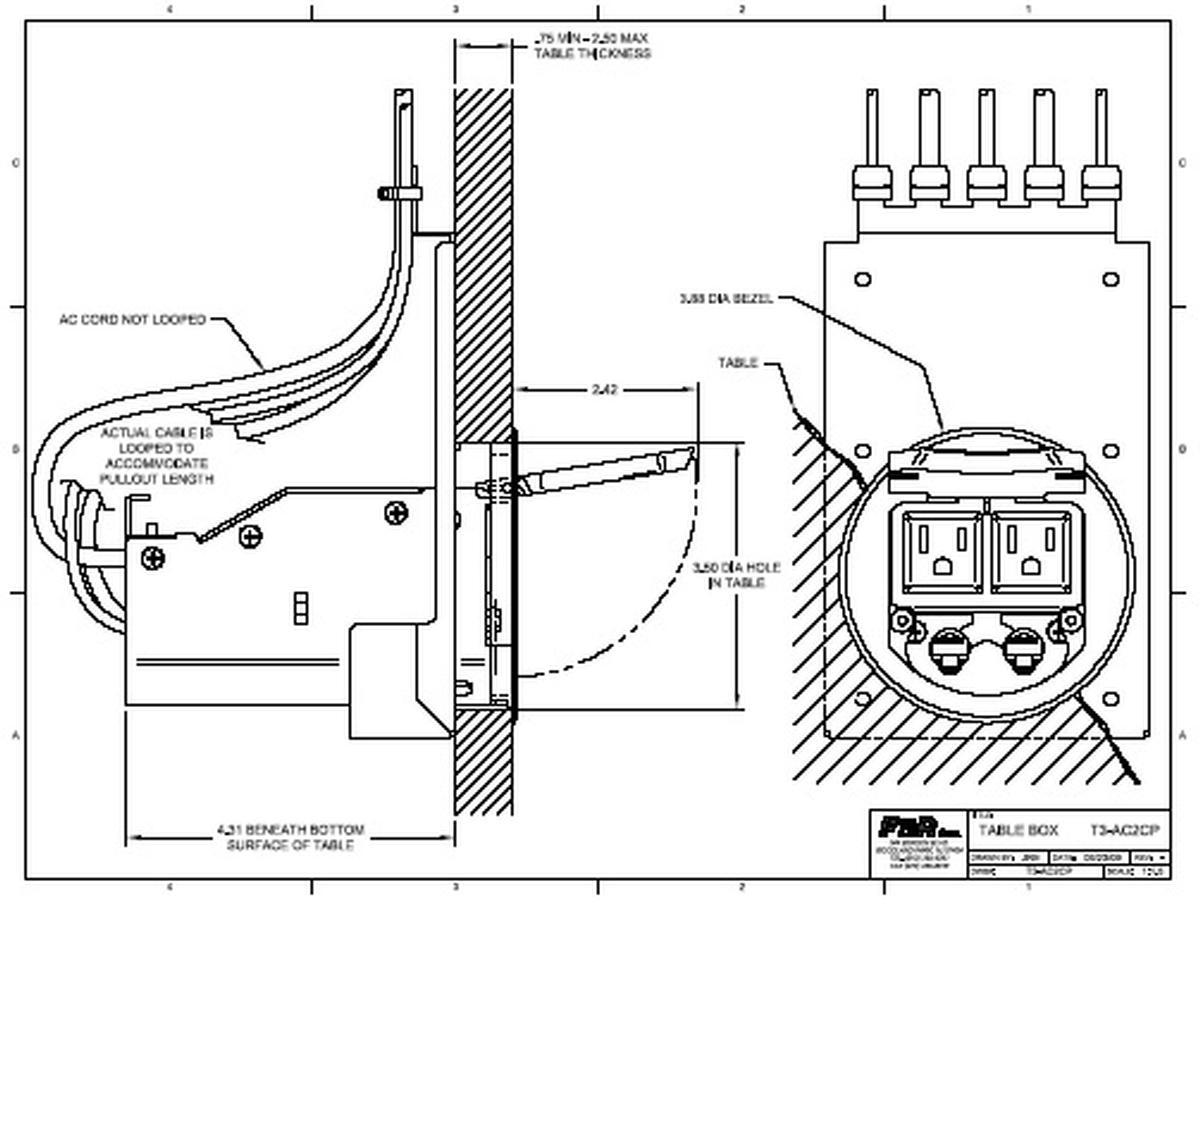 Fsr T3 Ac2hw Cp Blk 2 Ac Hardwired Amp 2 9 Cat 5 Pulls